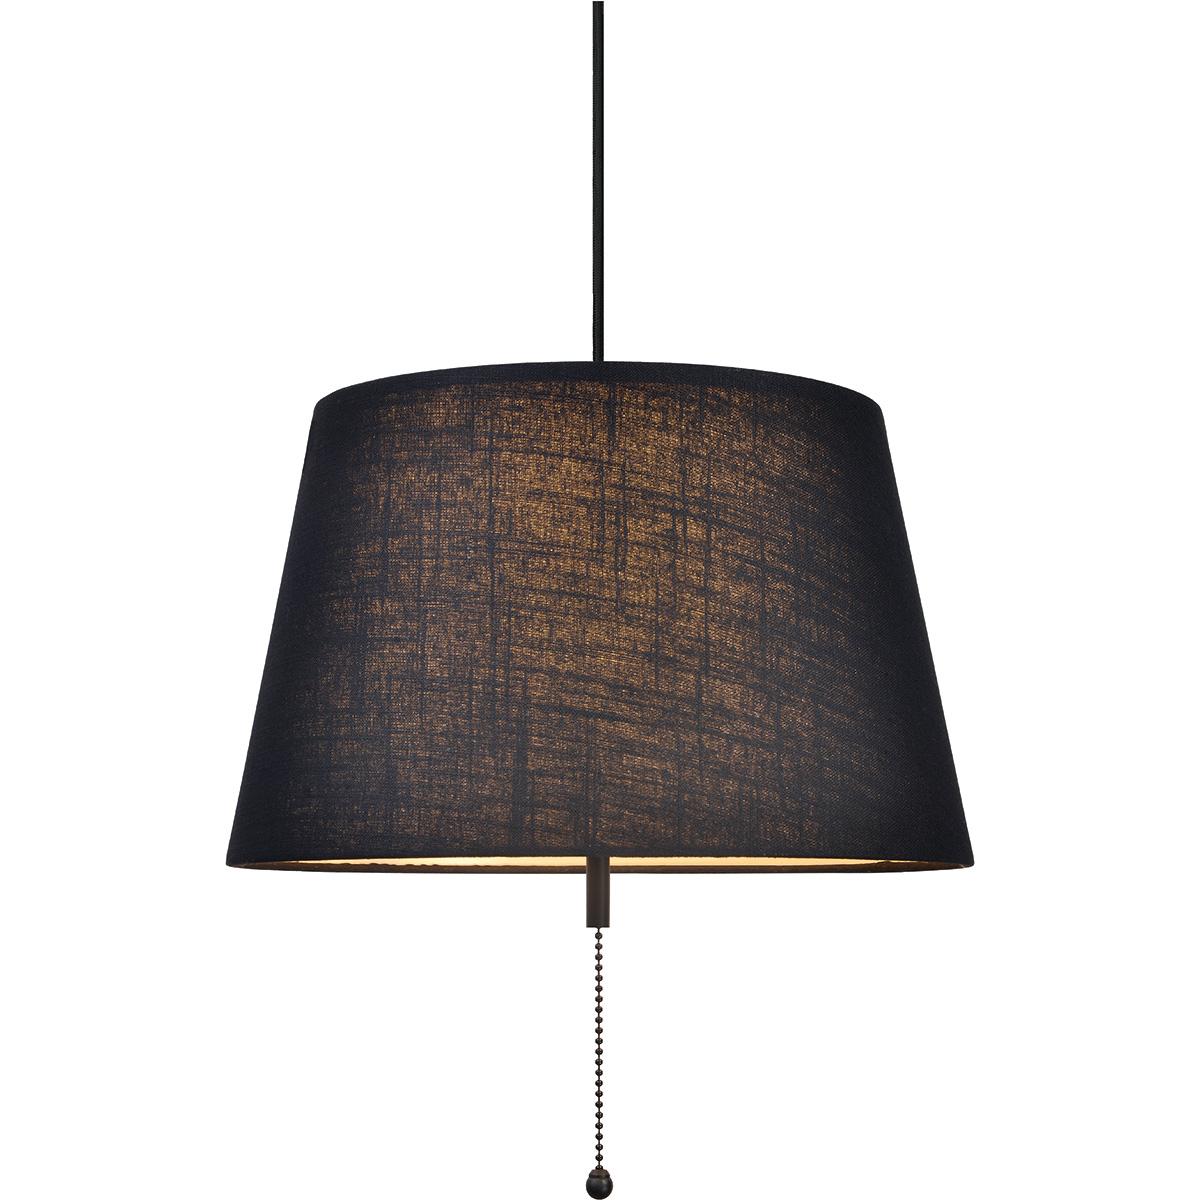 Image of   Halo Design loftlampe - Tower - Sort